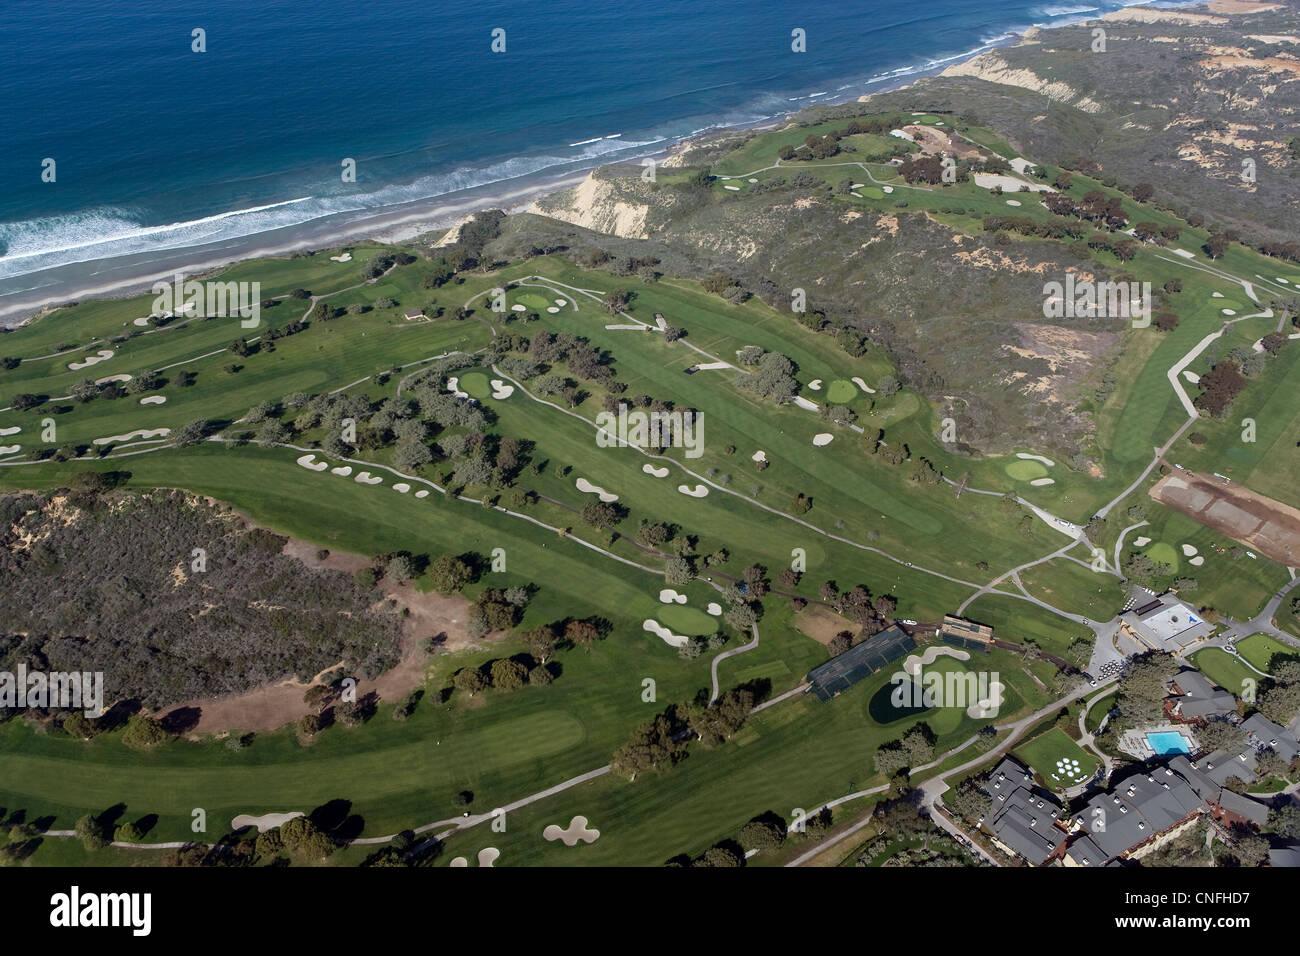 aerial photograph Torrey Pines Golf Course, La Jolla, California - Stock Image